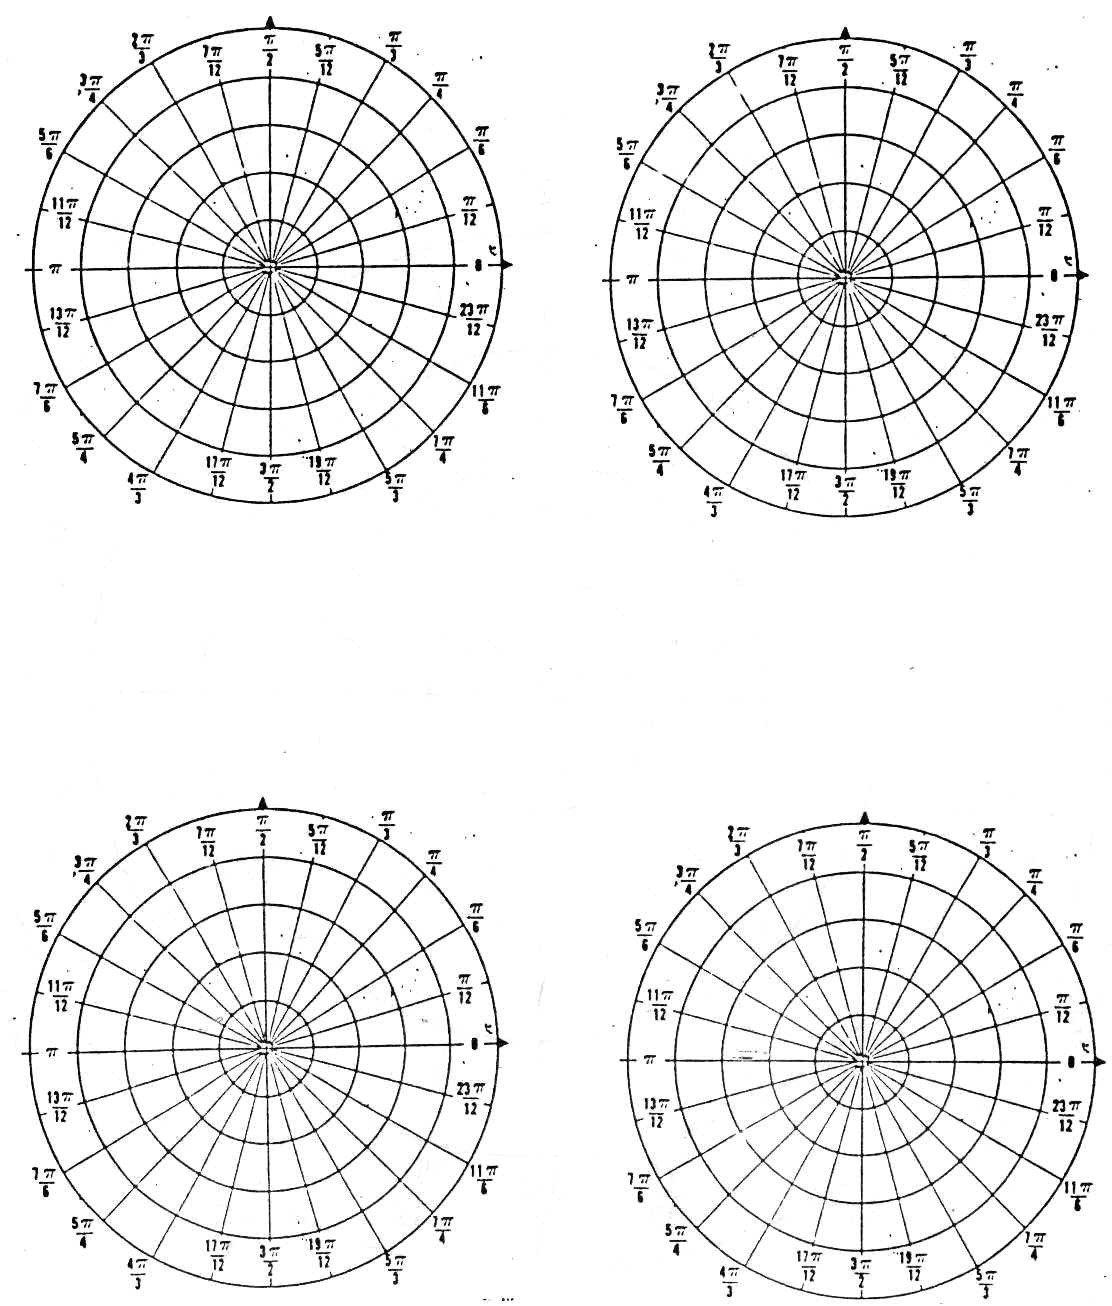 Polar Coordinate Graph Paper Polar Radians 4